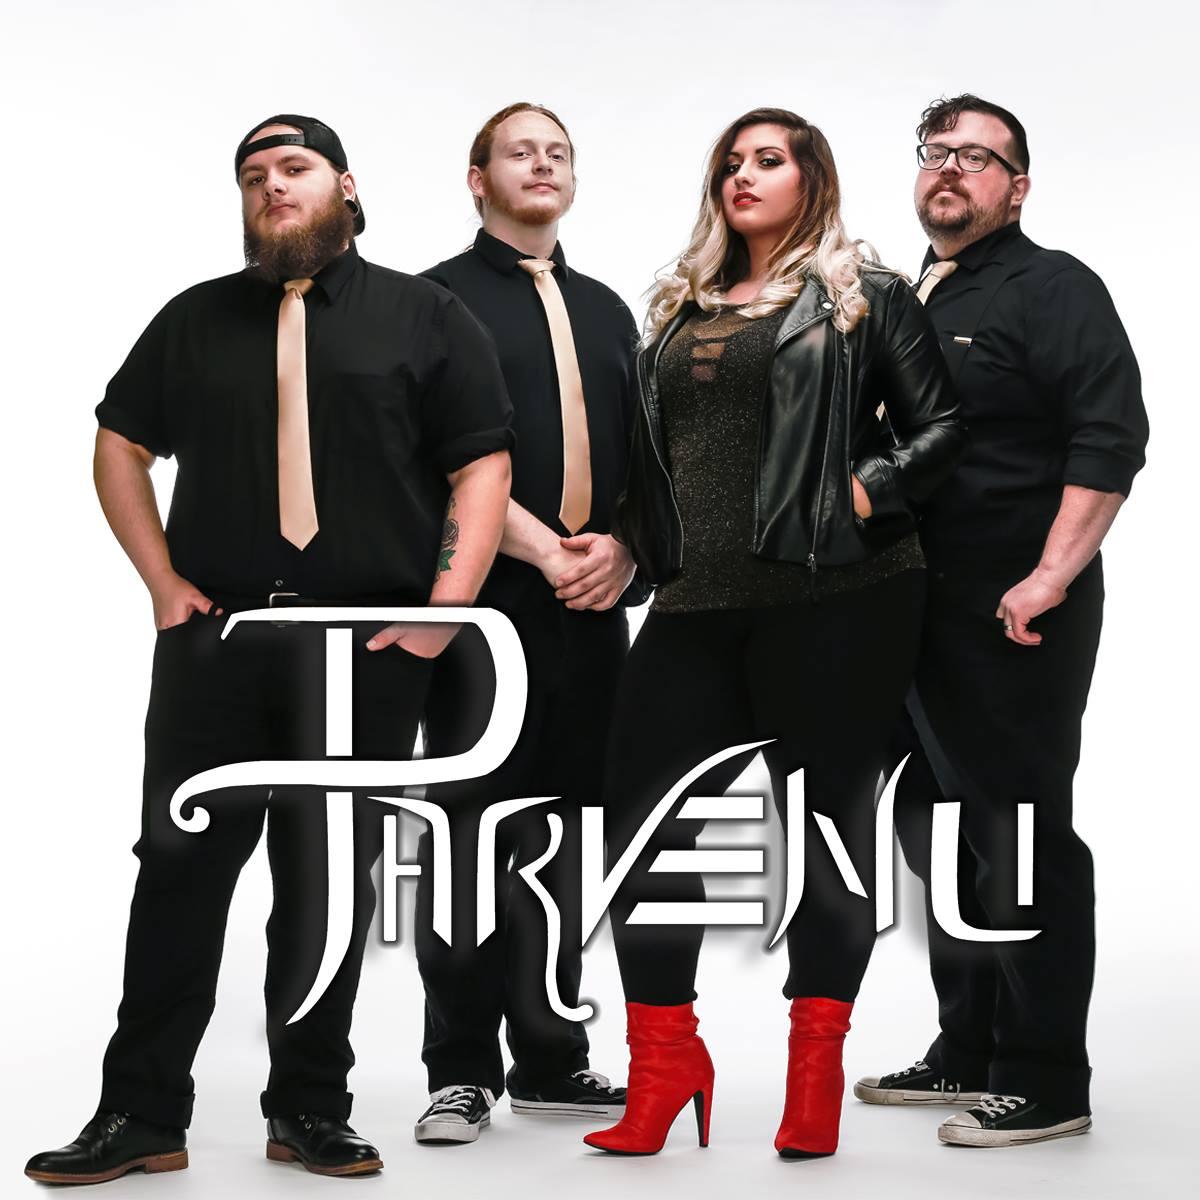 ALBUM REVIEW: Kansas City's Parvenu showcase talent with first EP